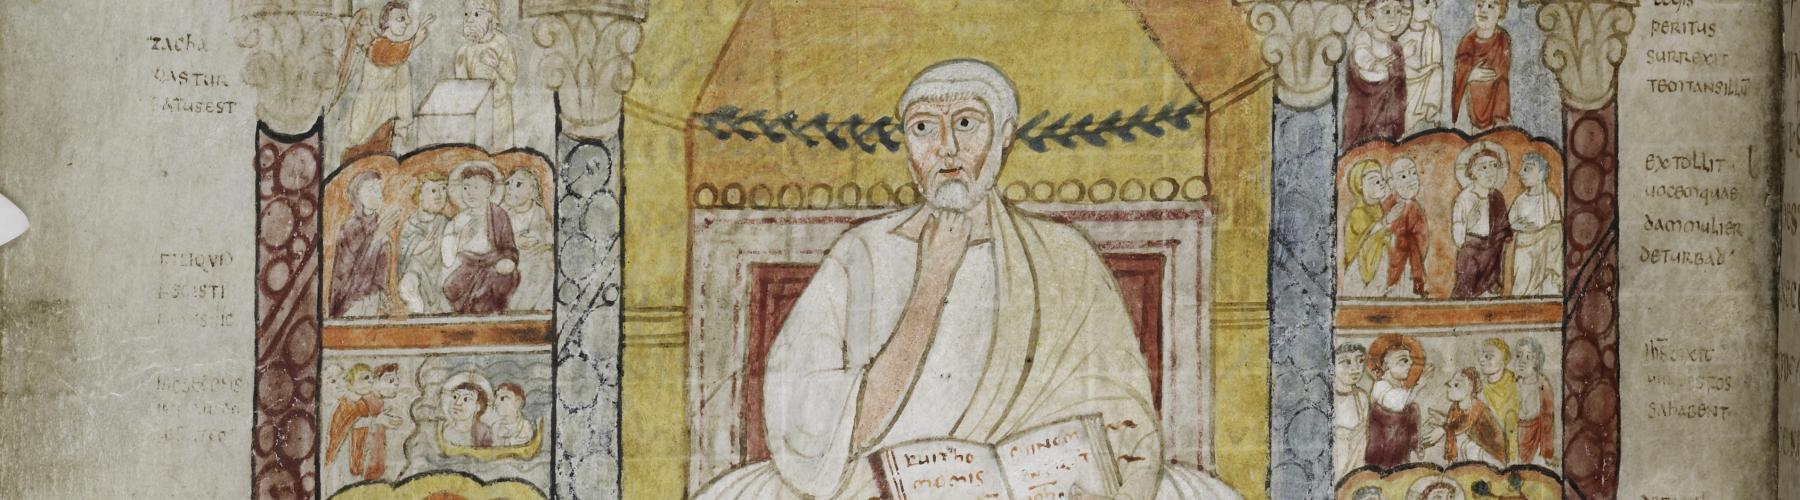 MS 286, the evangelist Luke